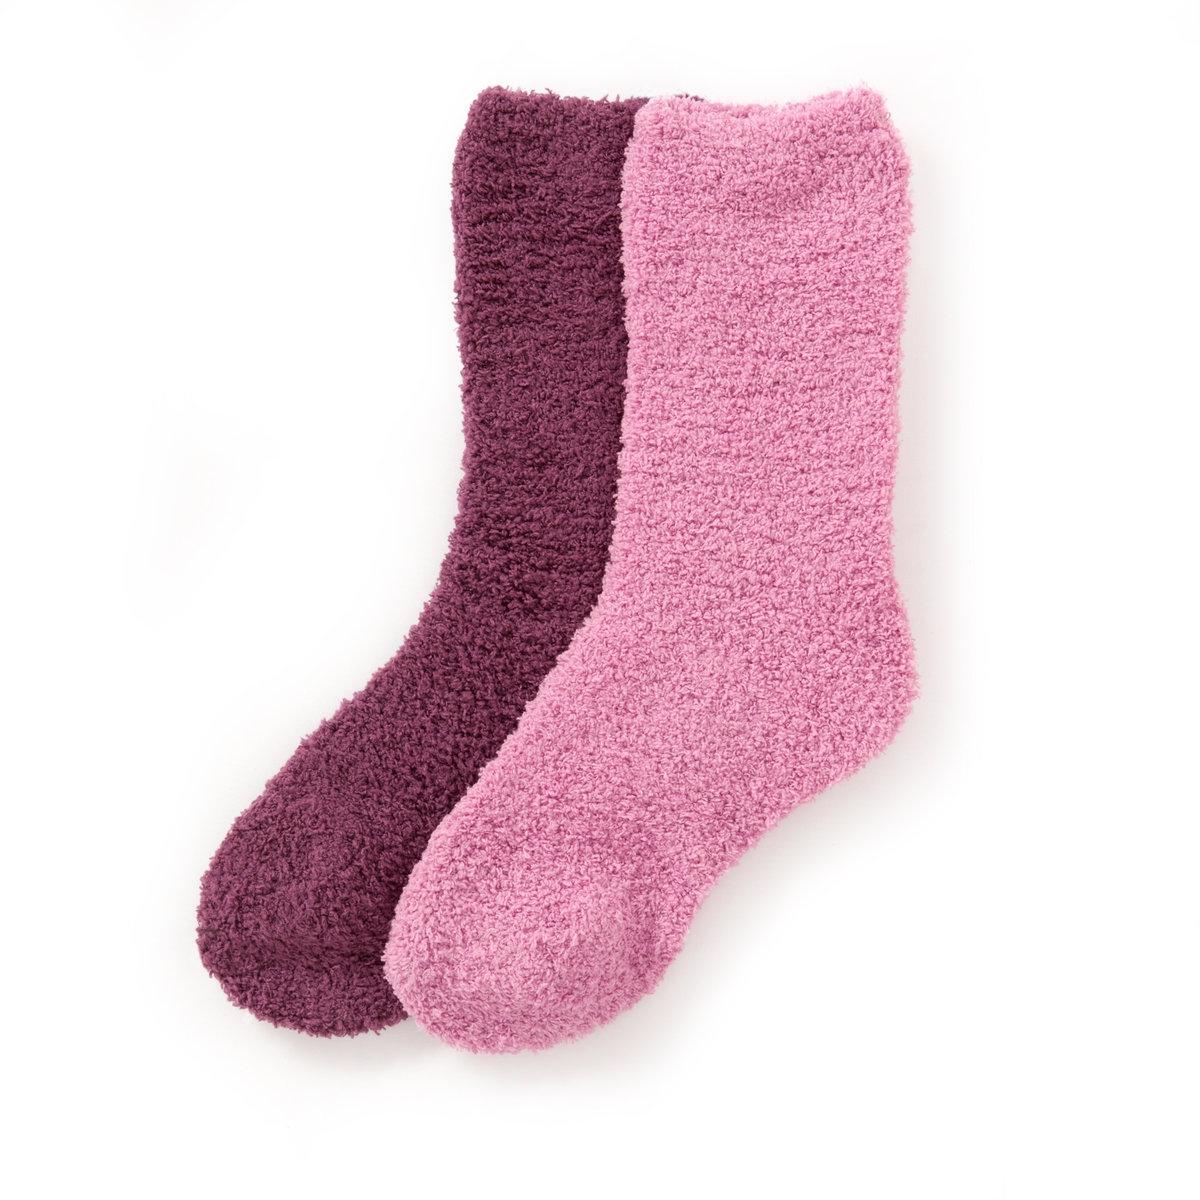 Женские носки из махрового трикотажа (комплект из 2 пар) от La Redoute